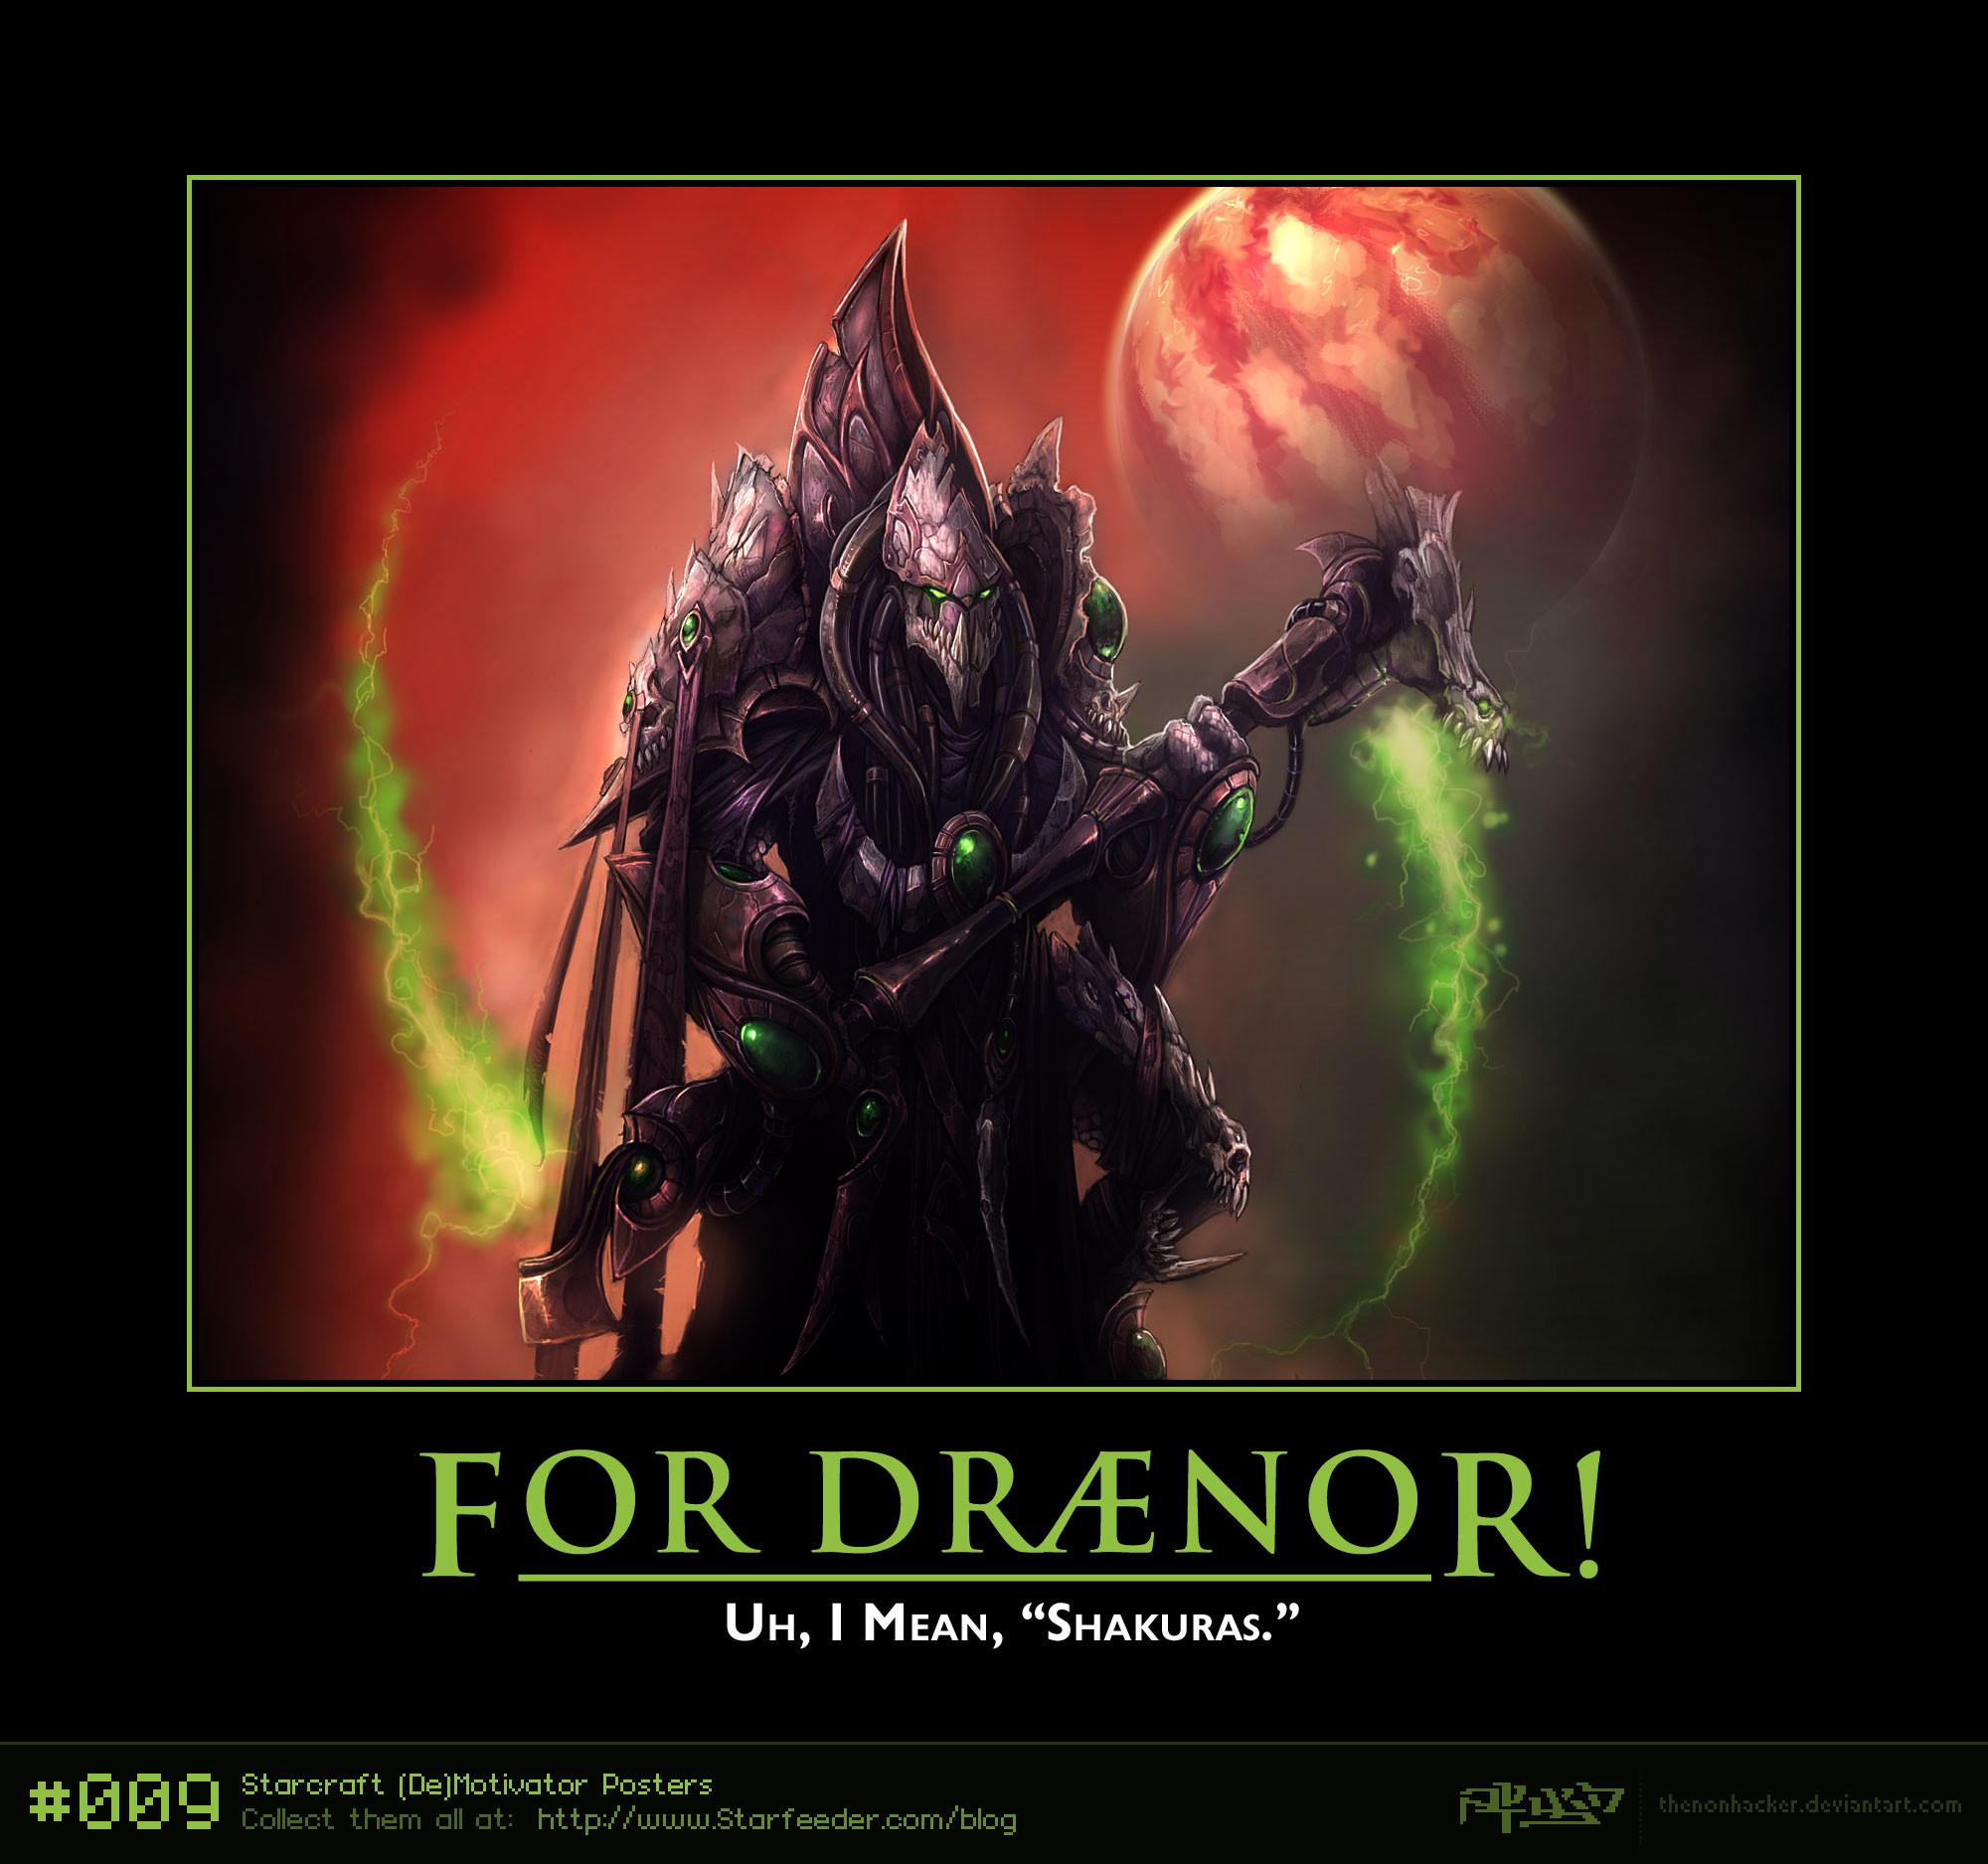 sc009 For Draenor Dark Templar by thenonhacker on DeviantArt